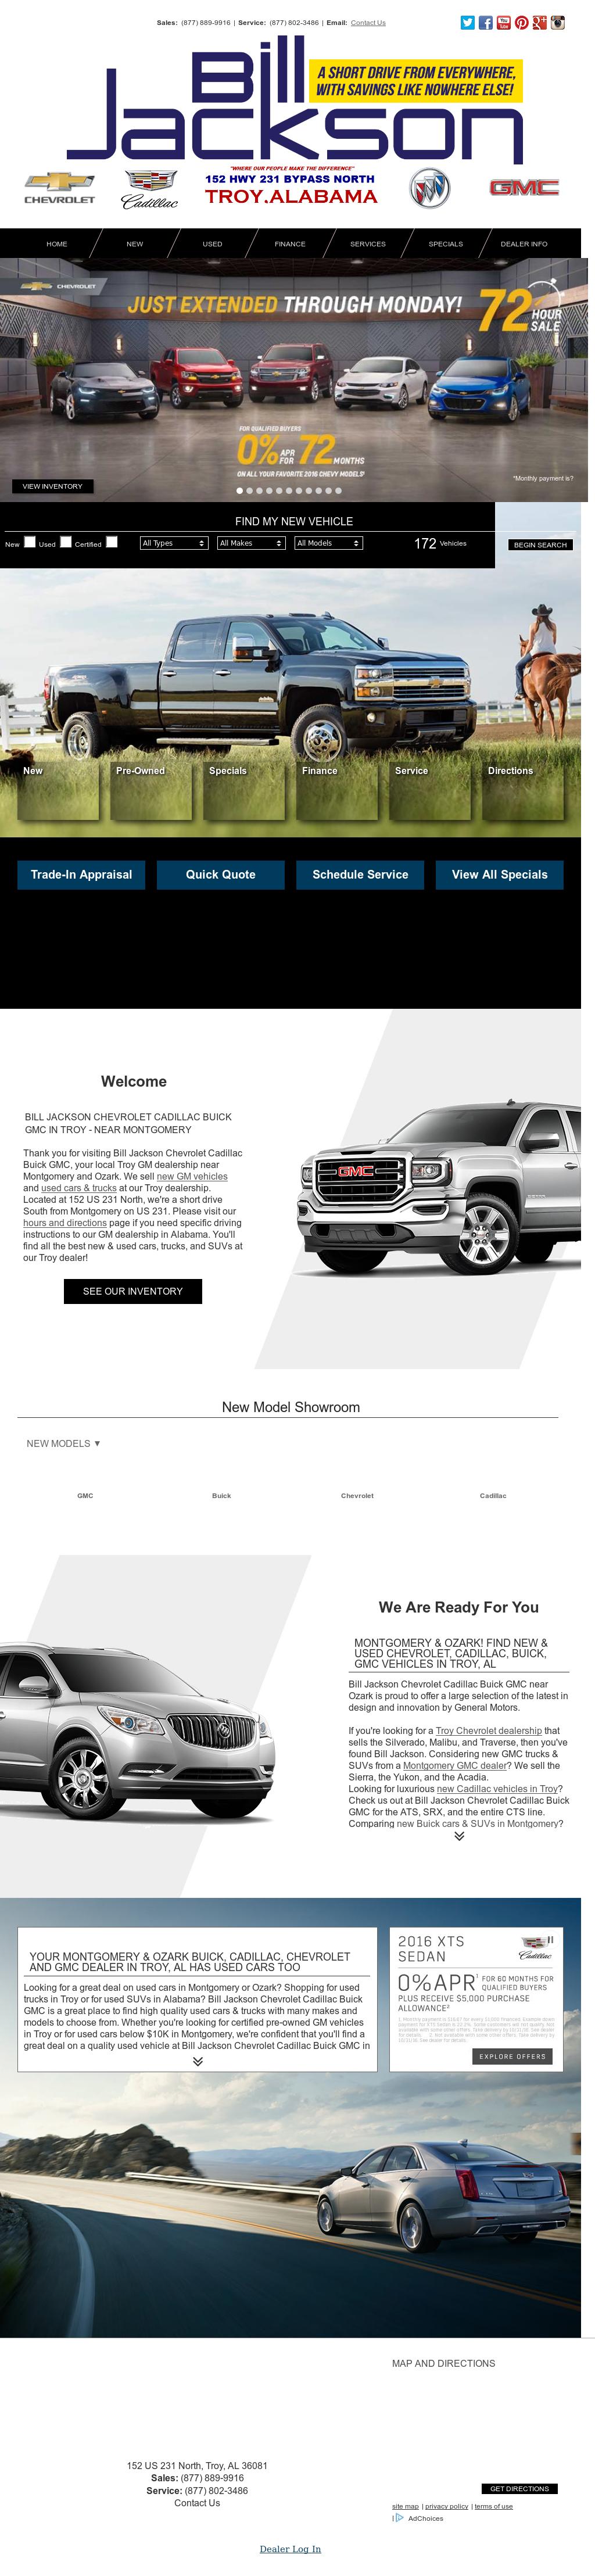 Bill Jackson Auto Competitors, Revenue And Employees   Owler Company Profile